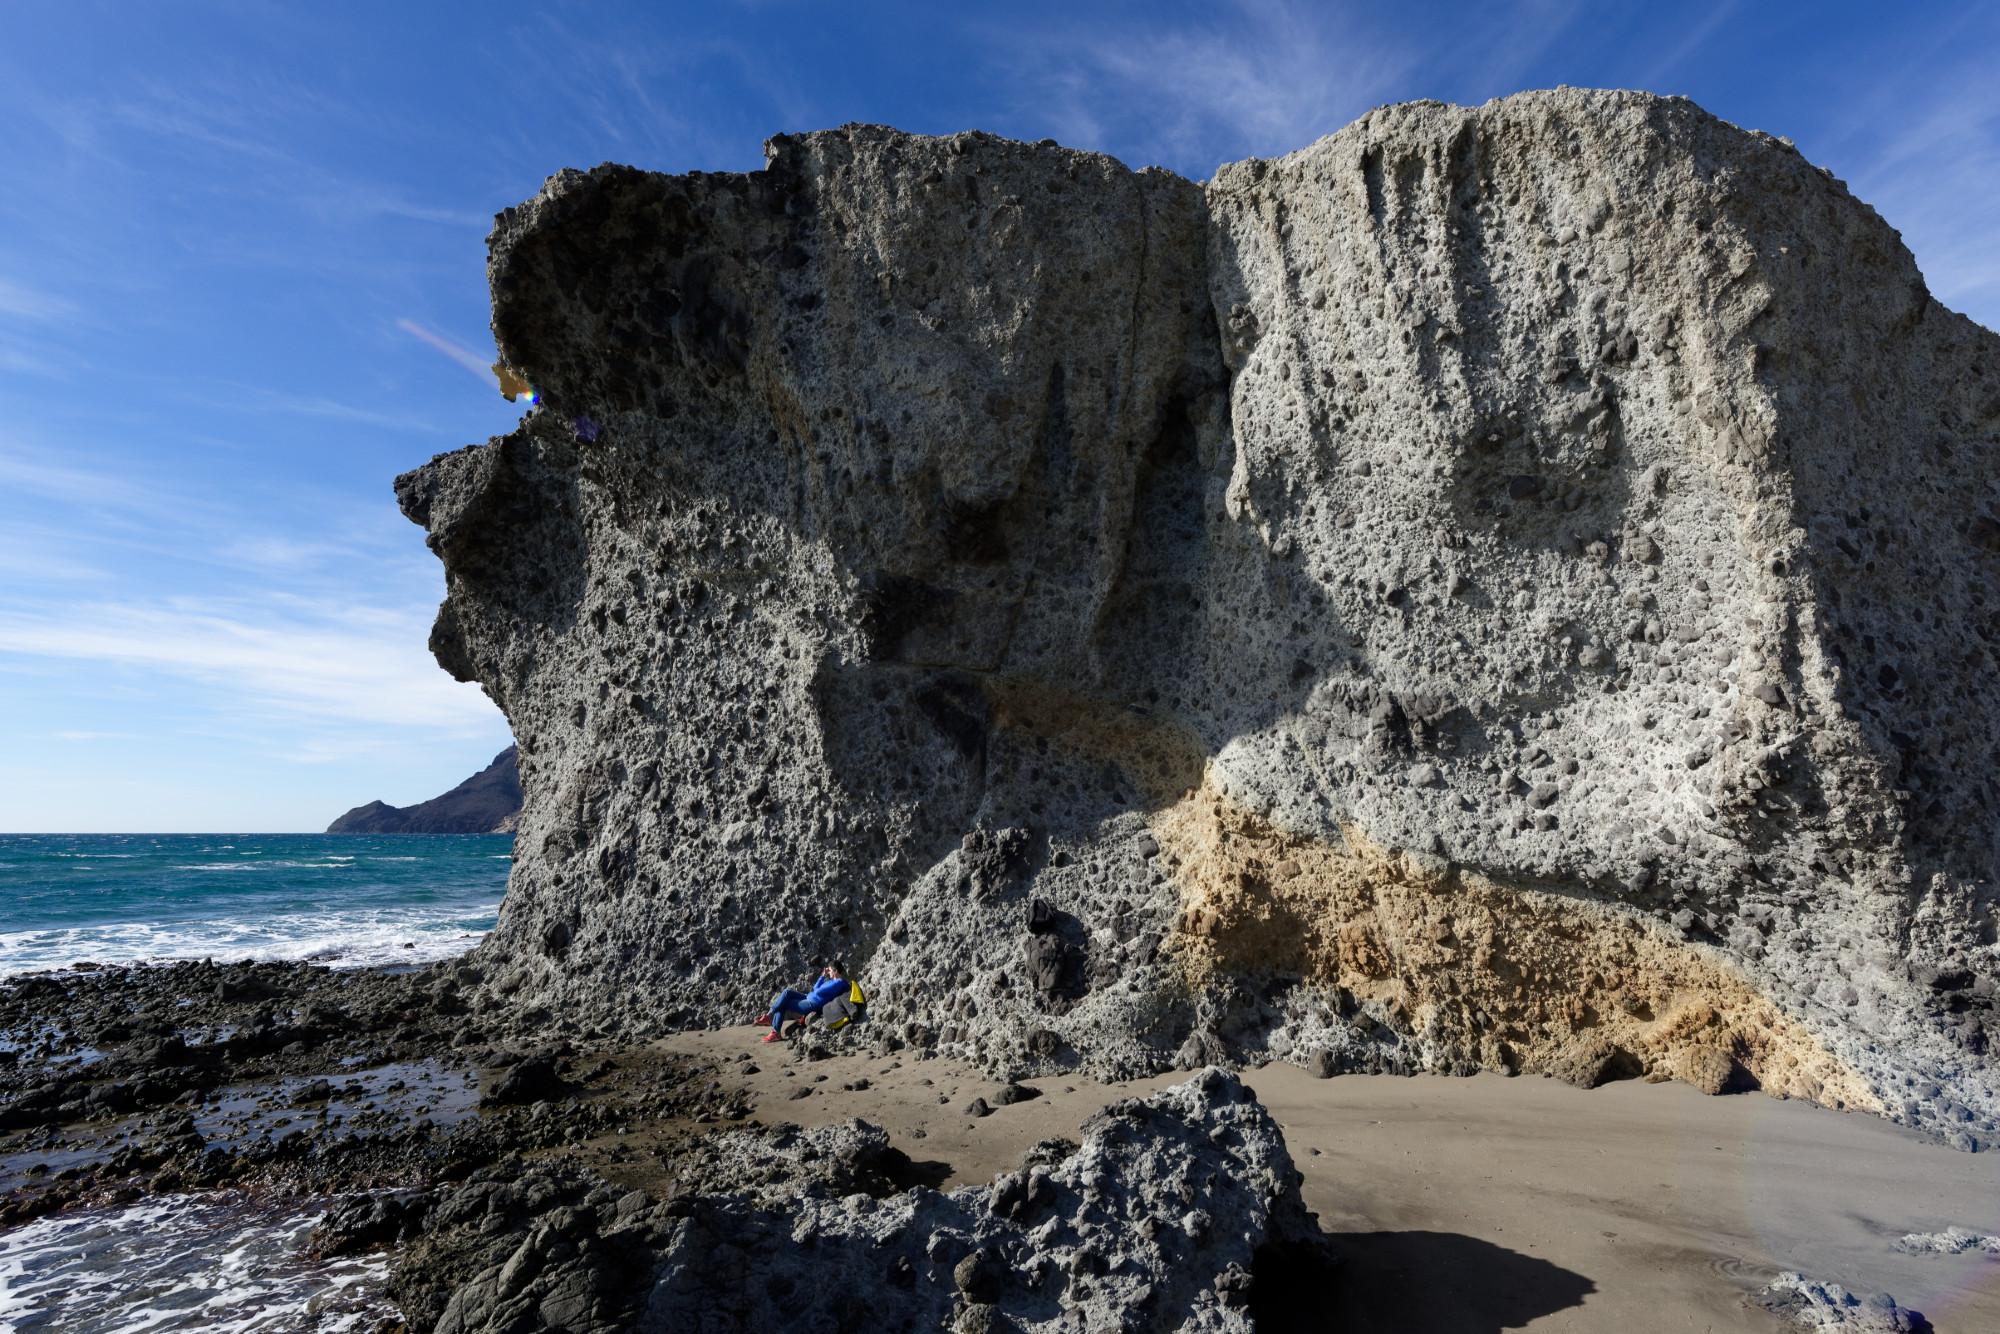 171214-San Jose-Playa del Monsul (Cabo de Gata-Andalousie) (183)